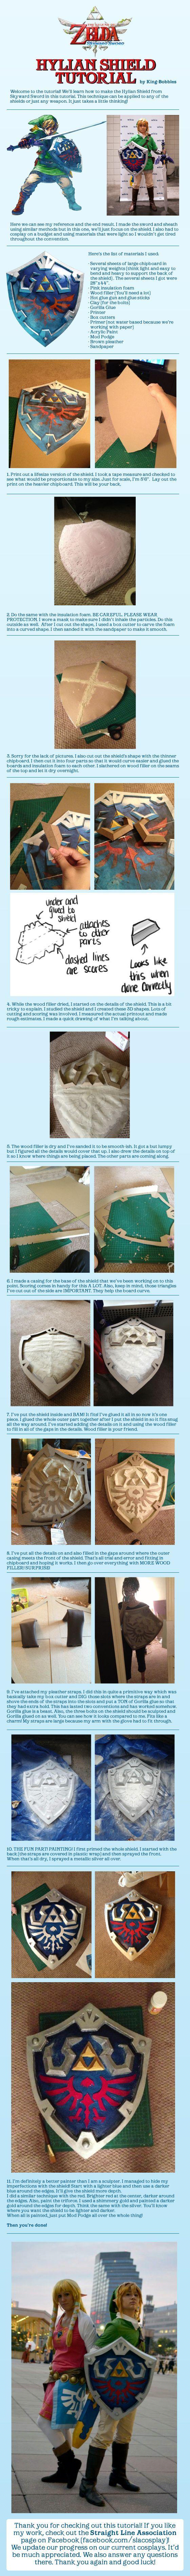 The Legend of Zelda Hylian Shield Cosplay Tutorial by http://King-Bobbles.deviantart.com on @deviantART